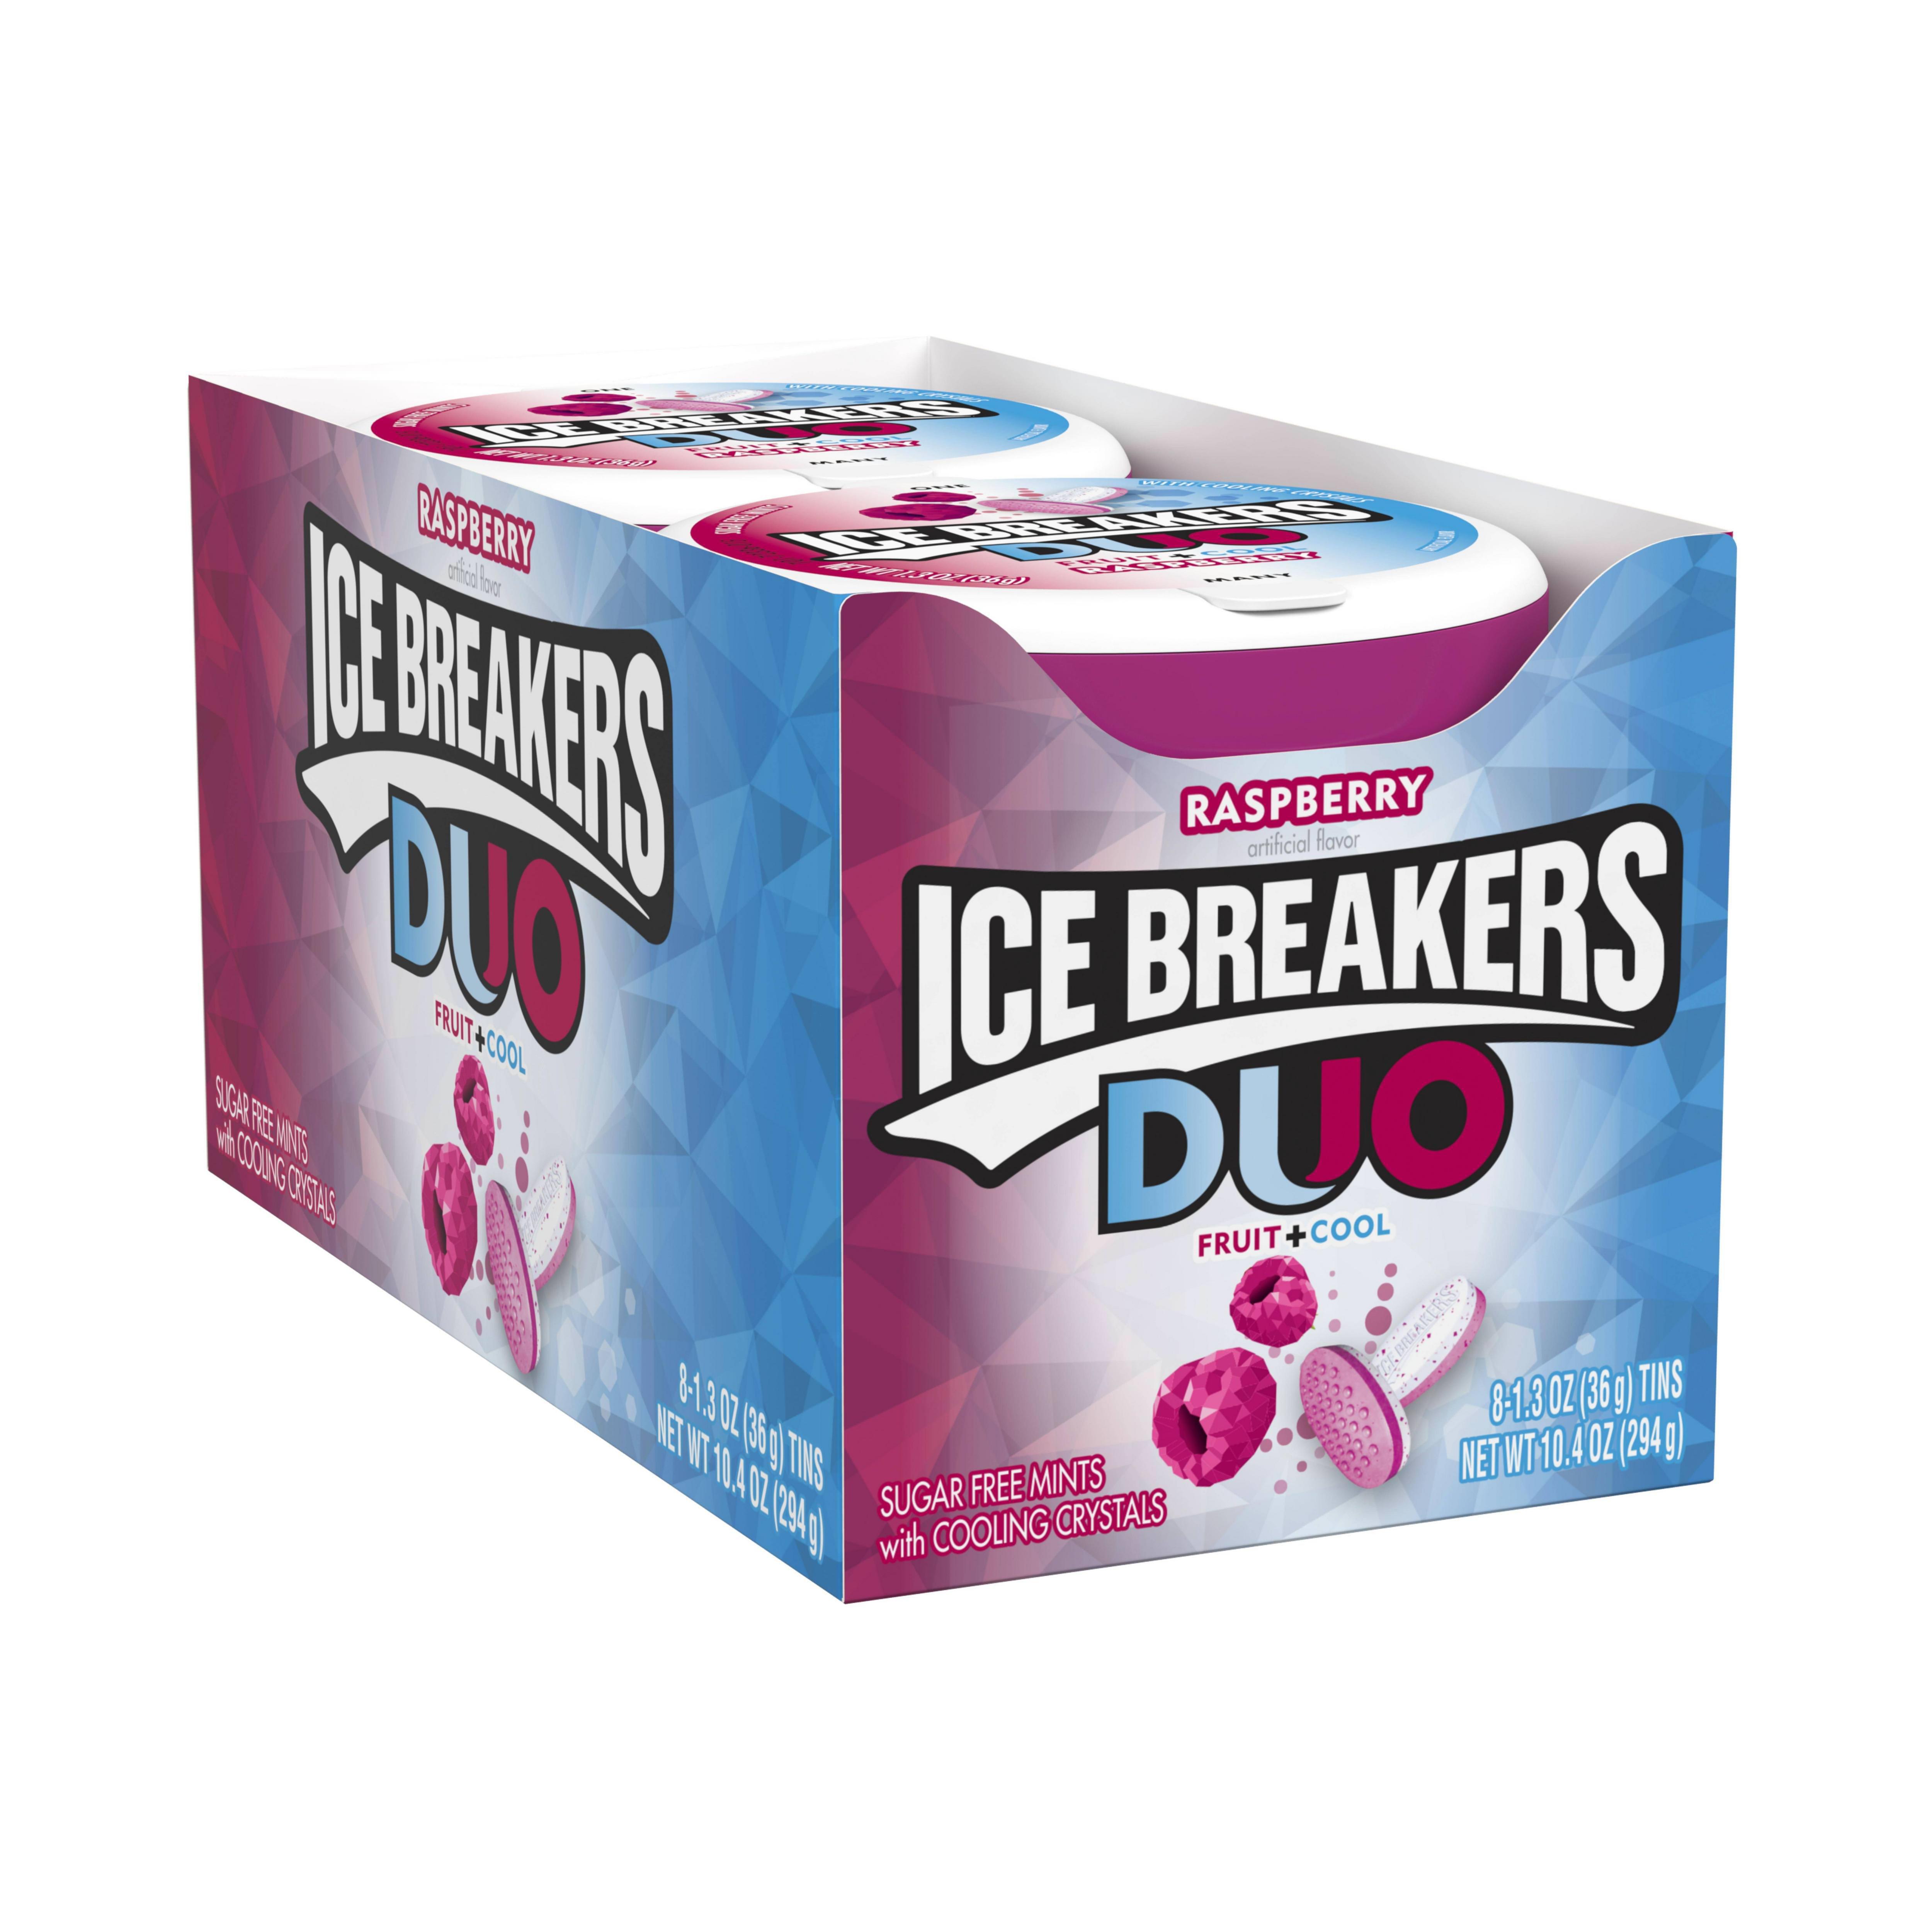 Ice Breakers, Sugar Free Duo Fruit & Cool Raspberry, 1.3 Oz, 8 Ct